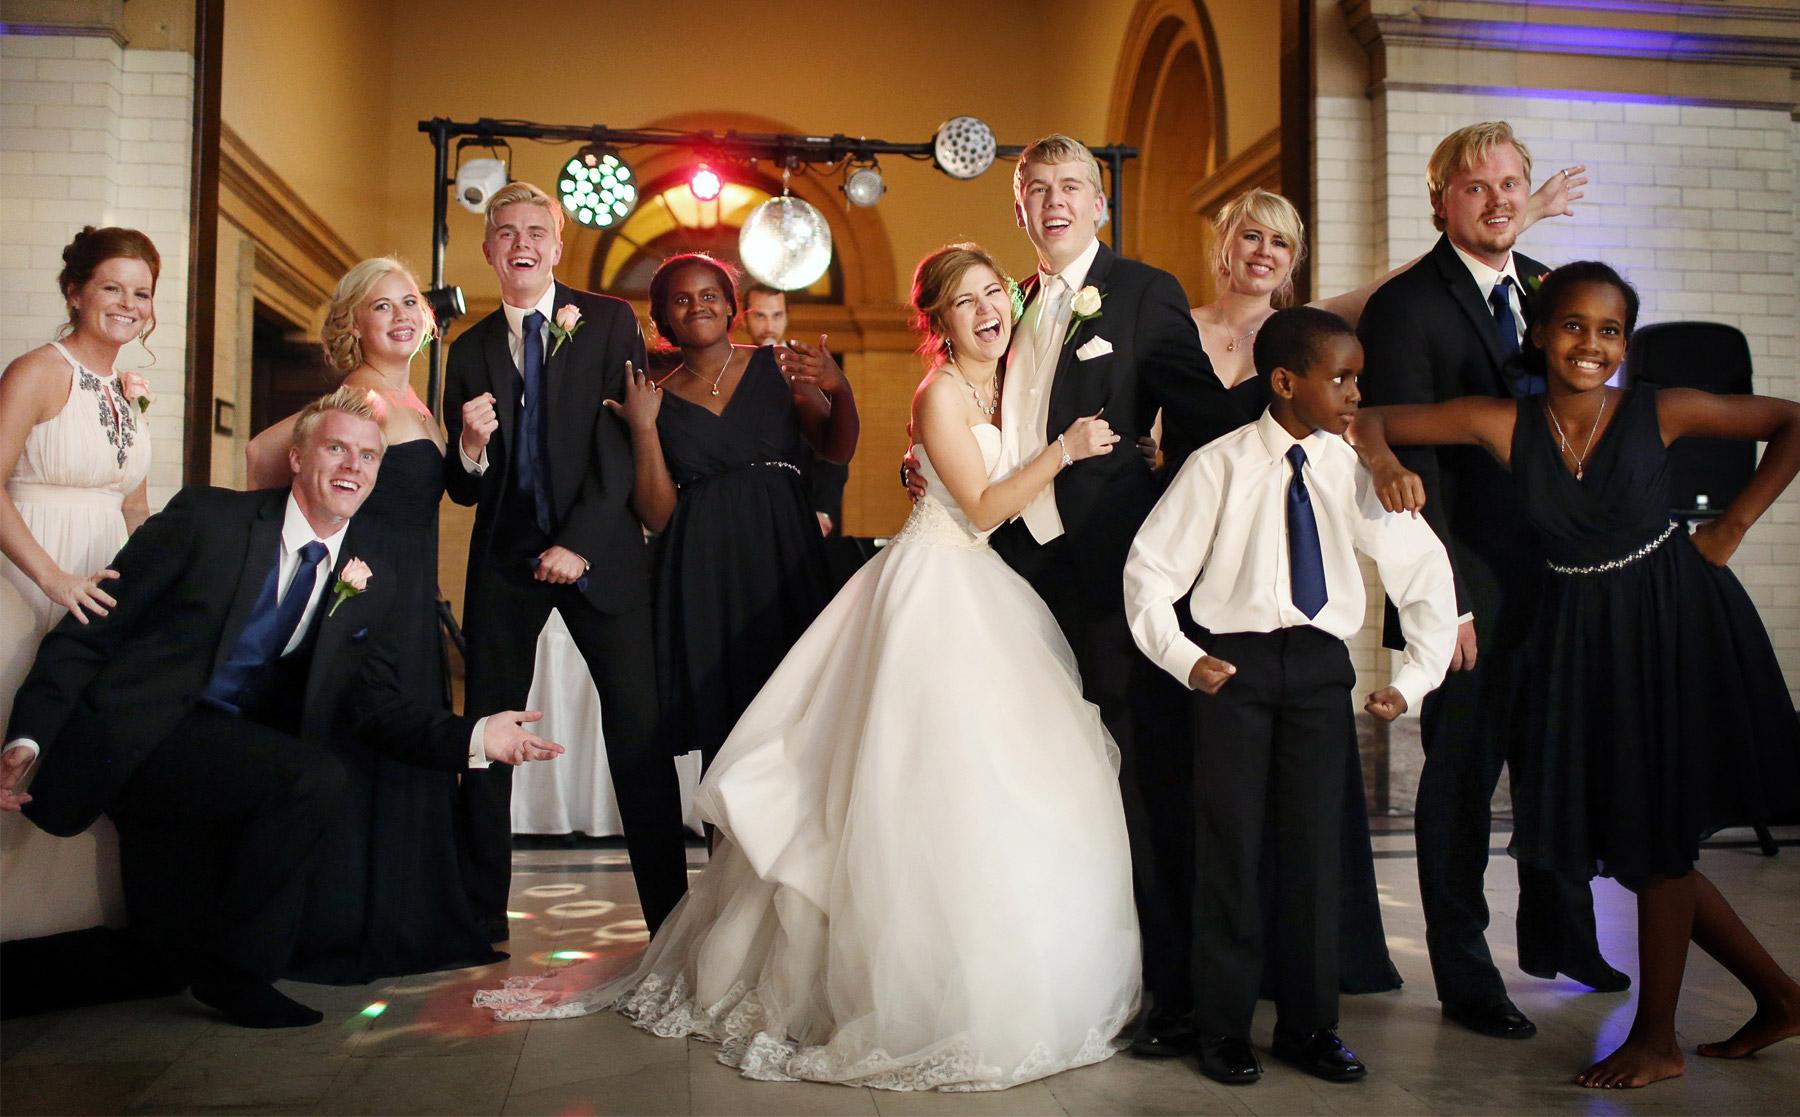 15-Minneapolis-Minnesota-Wedding-Photography-by-Vick-Photography-The-Depot-Reception-Dance-Courtney-&-John.jpg